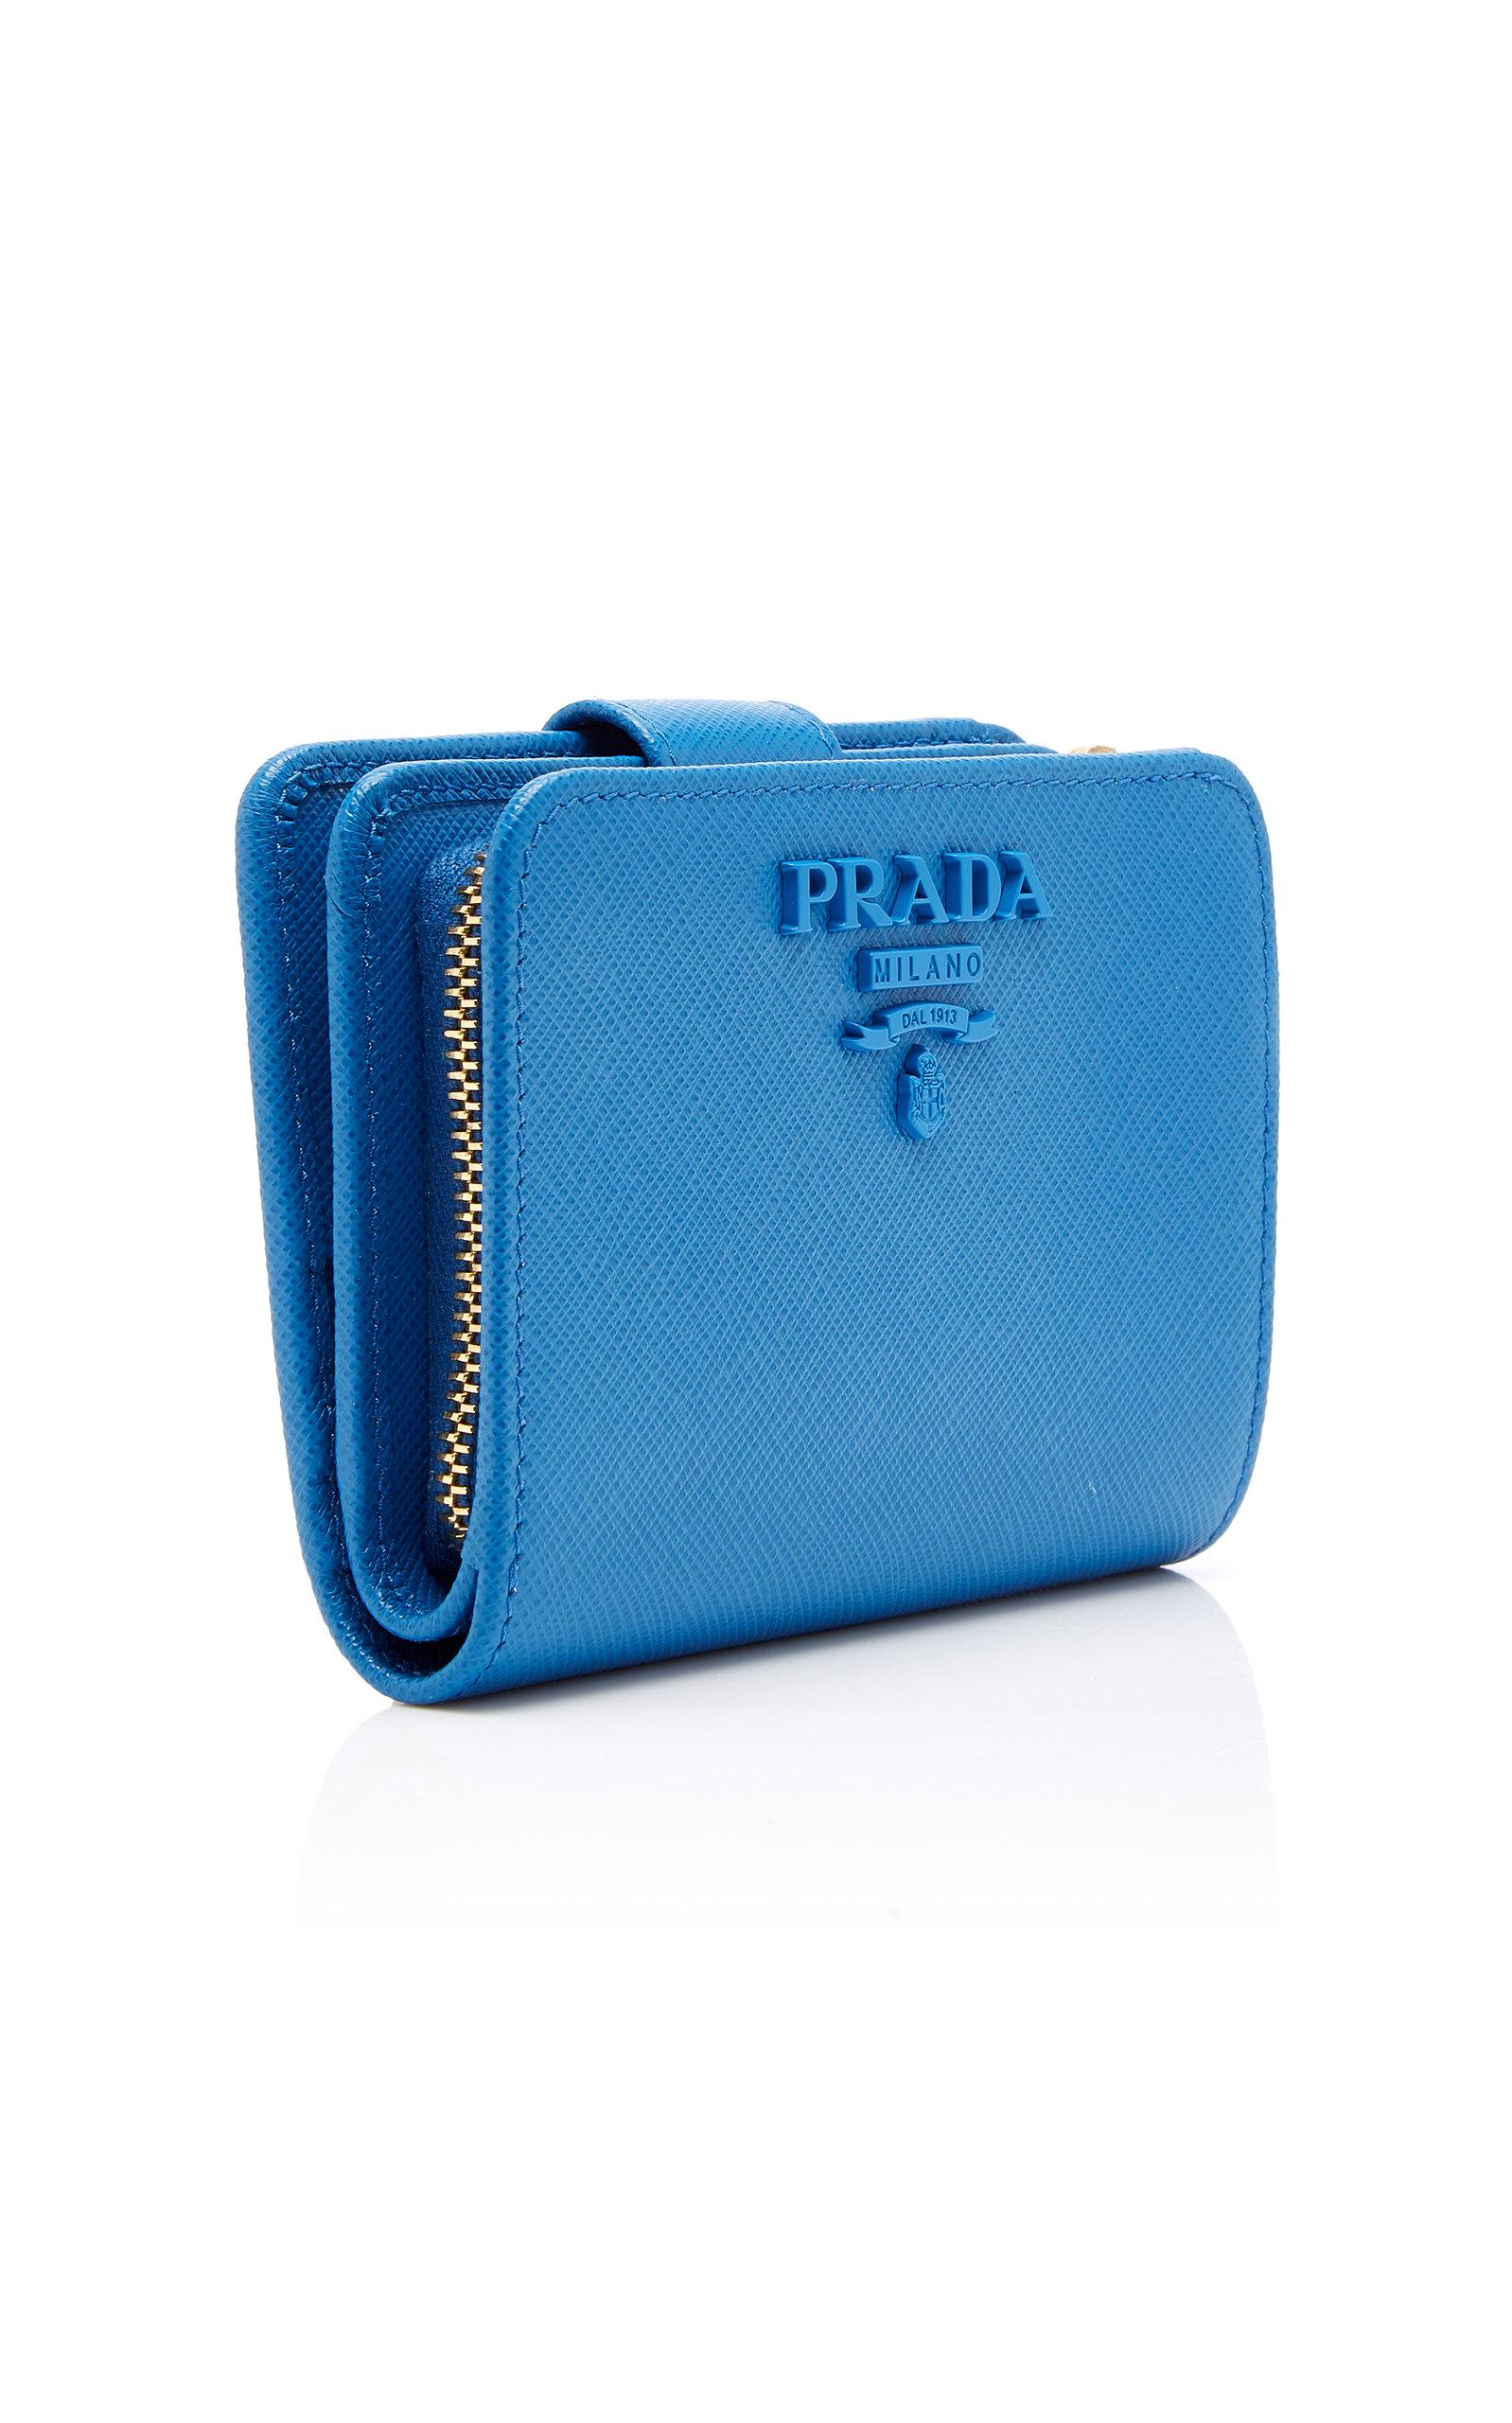 ade66ee530ff Prada - Blue Small Saffiano Leather Logo Wallet - Lyst. View fullscreen